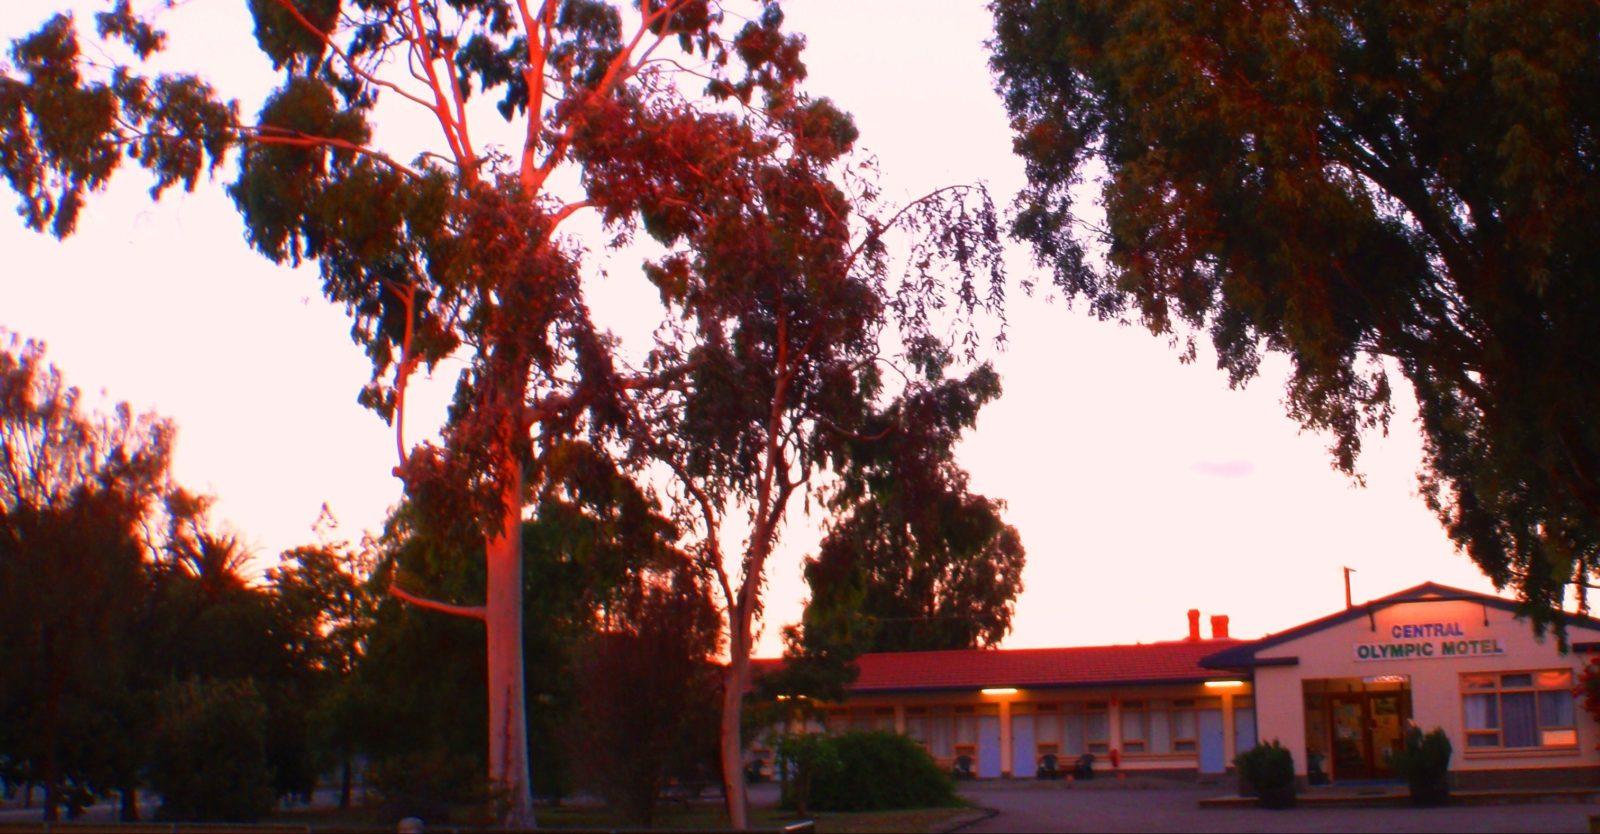 Central Olympic Motel - evening light